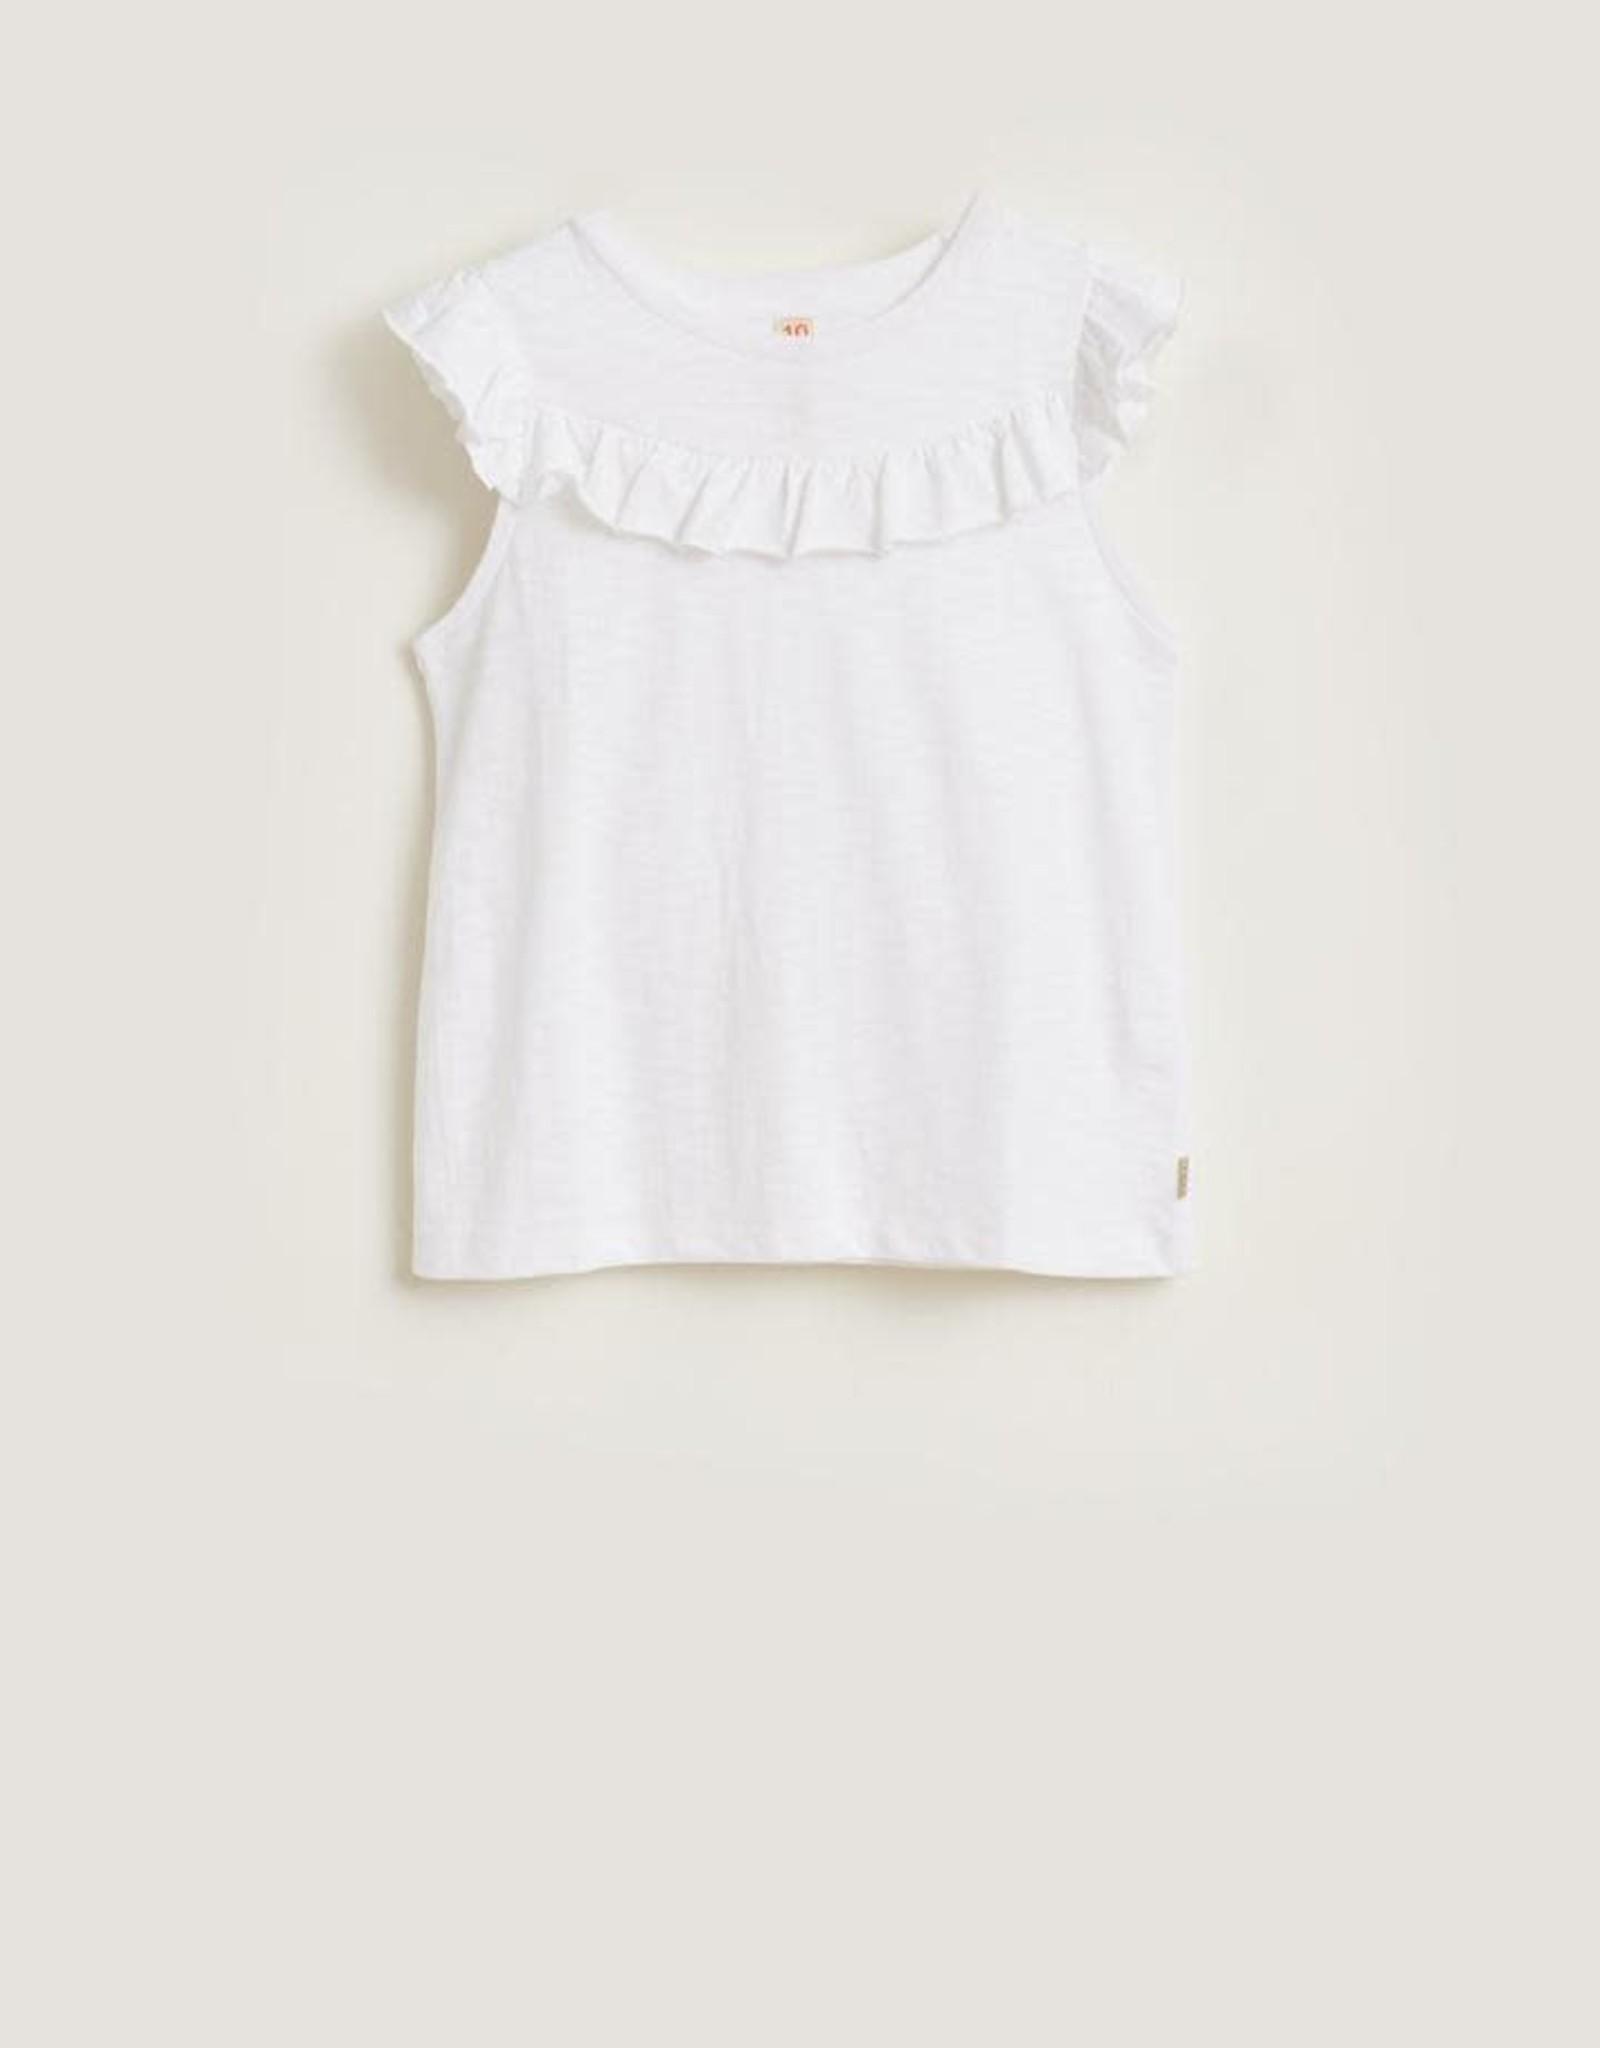 BELLEROSE BELLEROSE Misu Vintage White